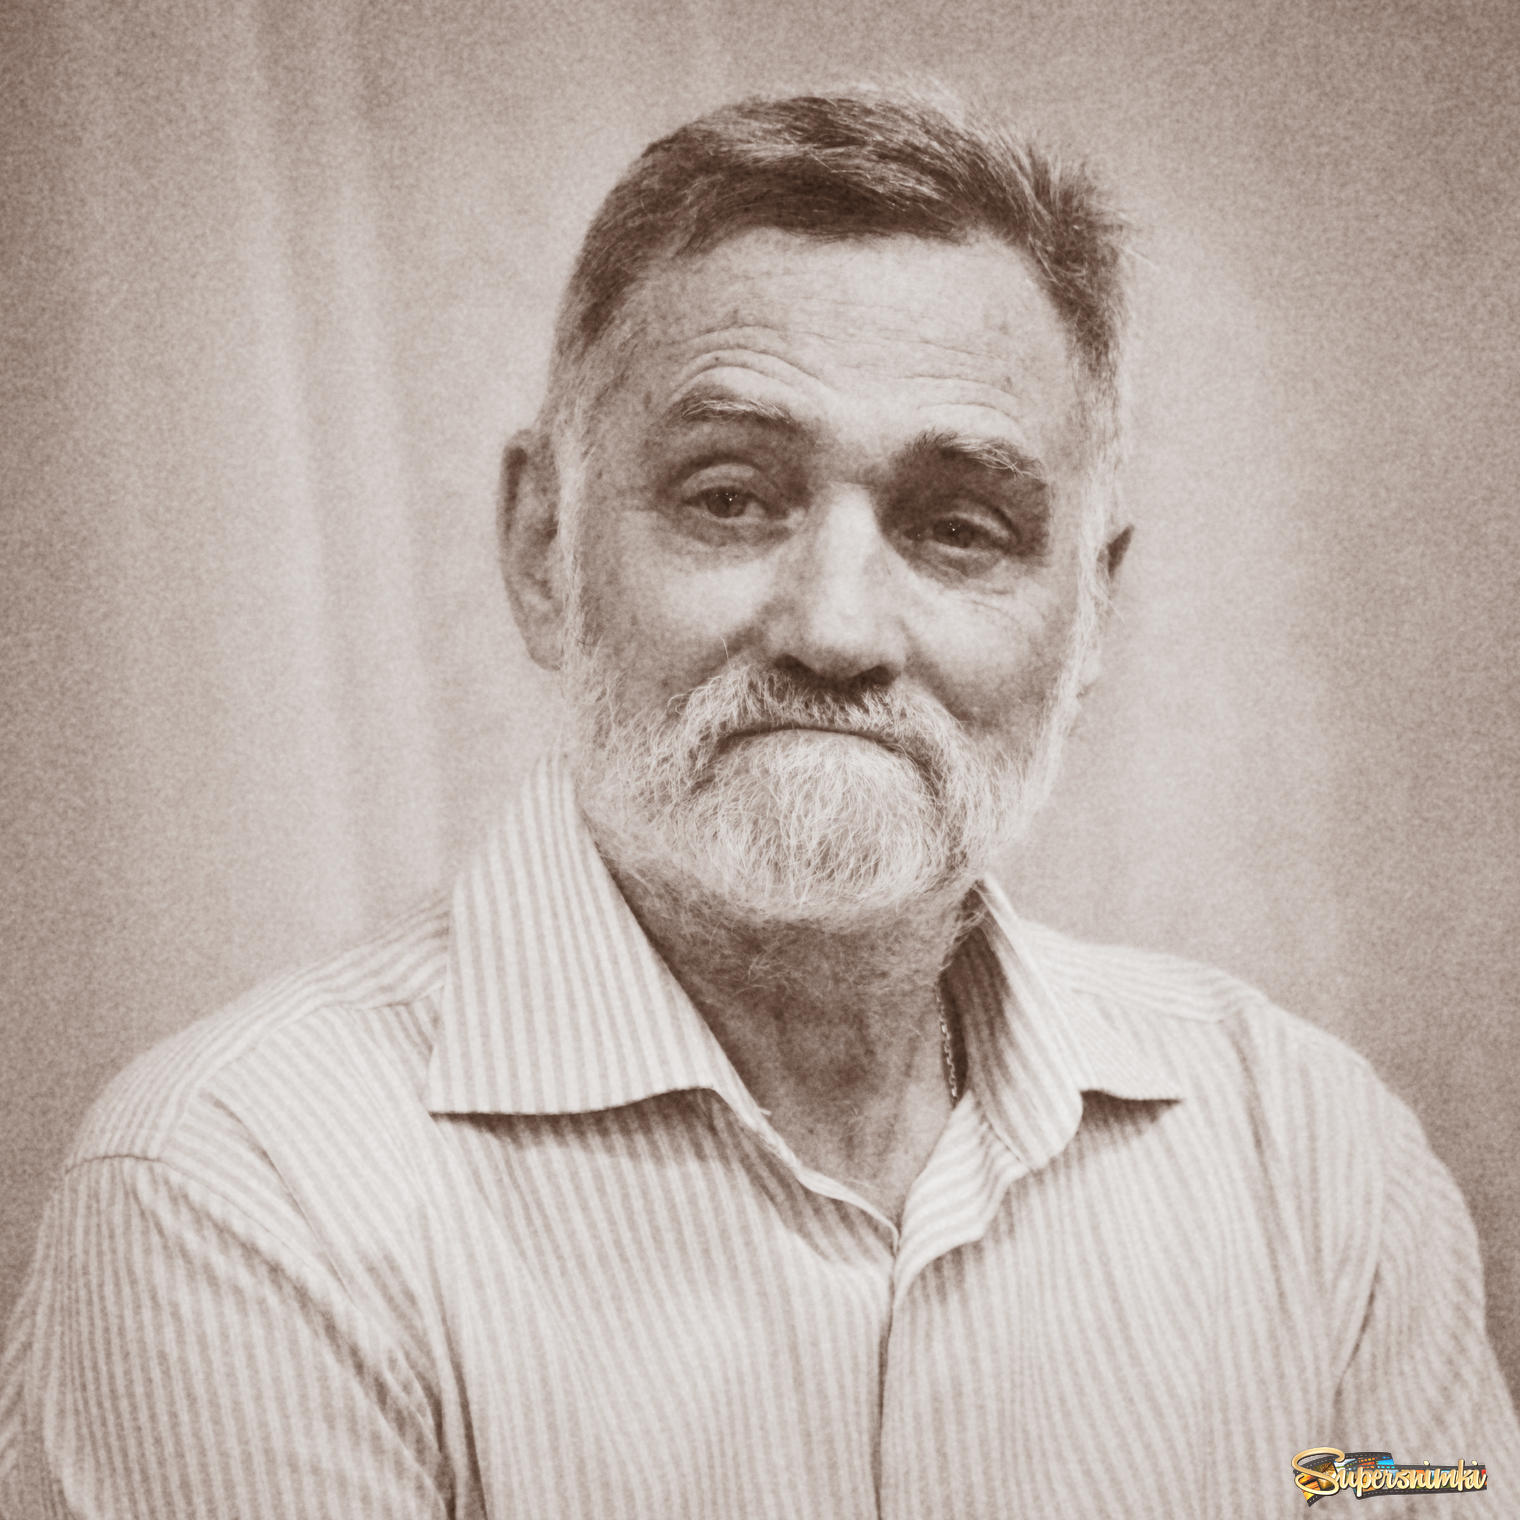 Михаил Бабенков (2017) | Фотосайт СуперСнимки.Ру